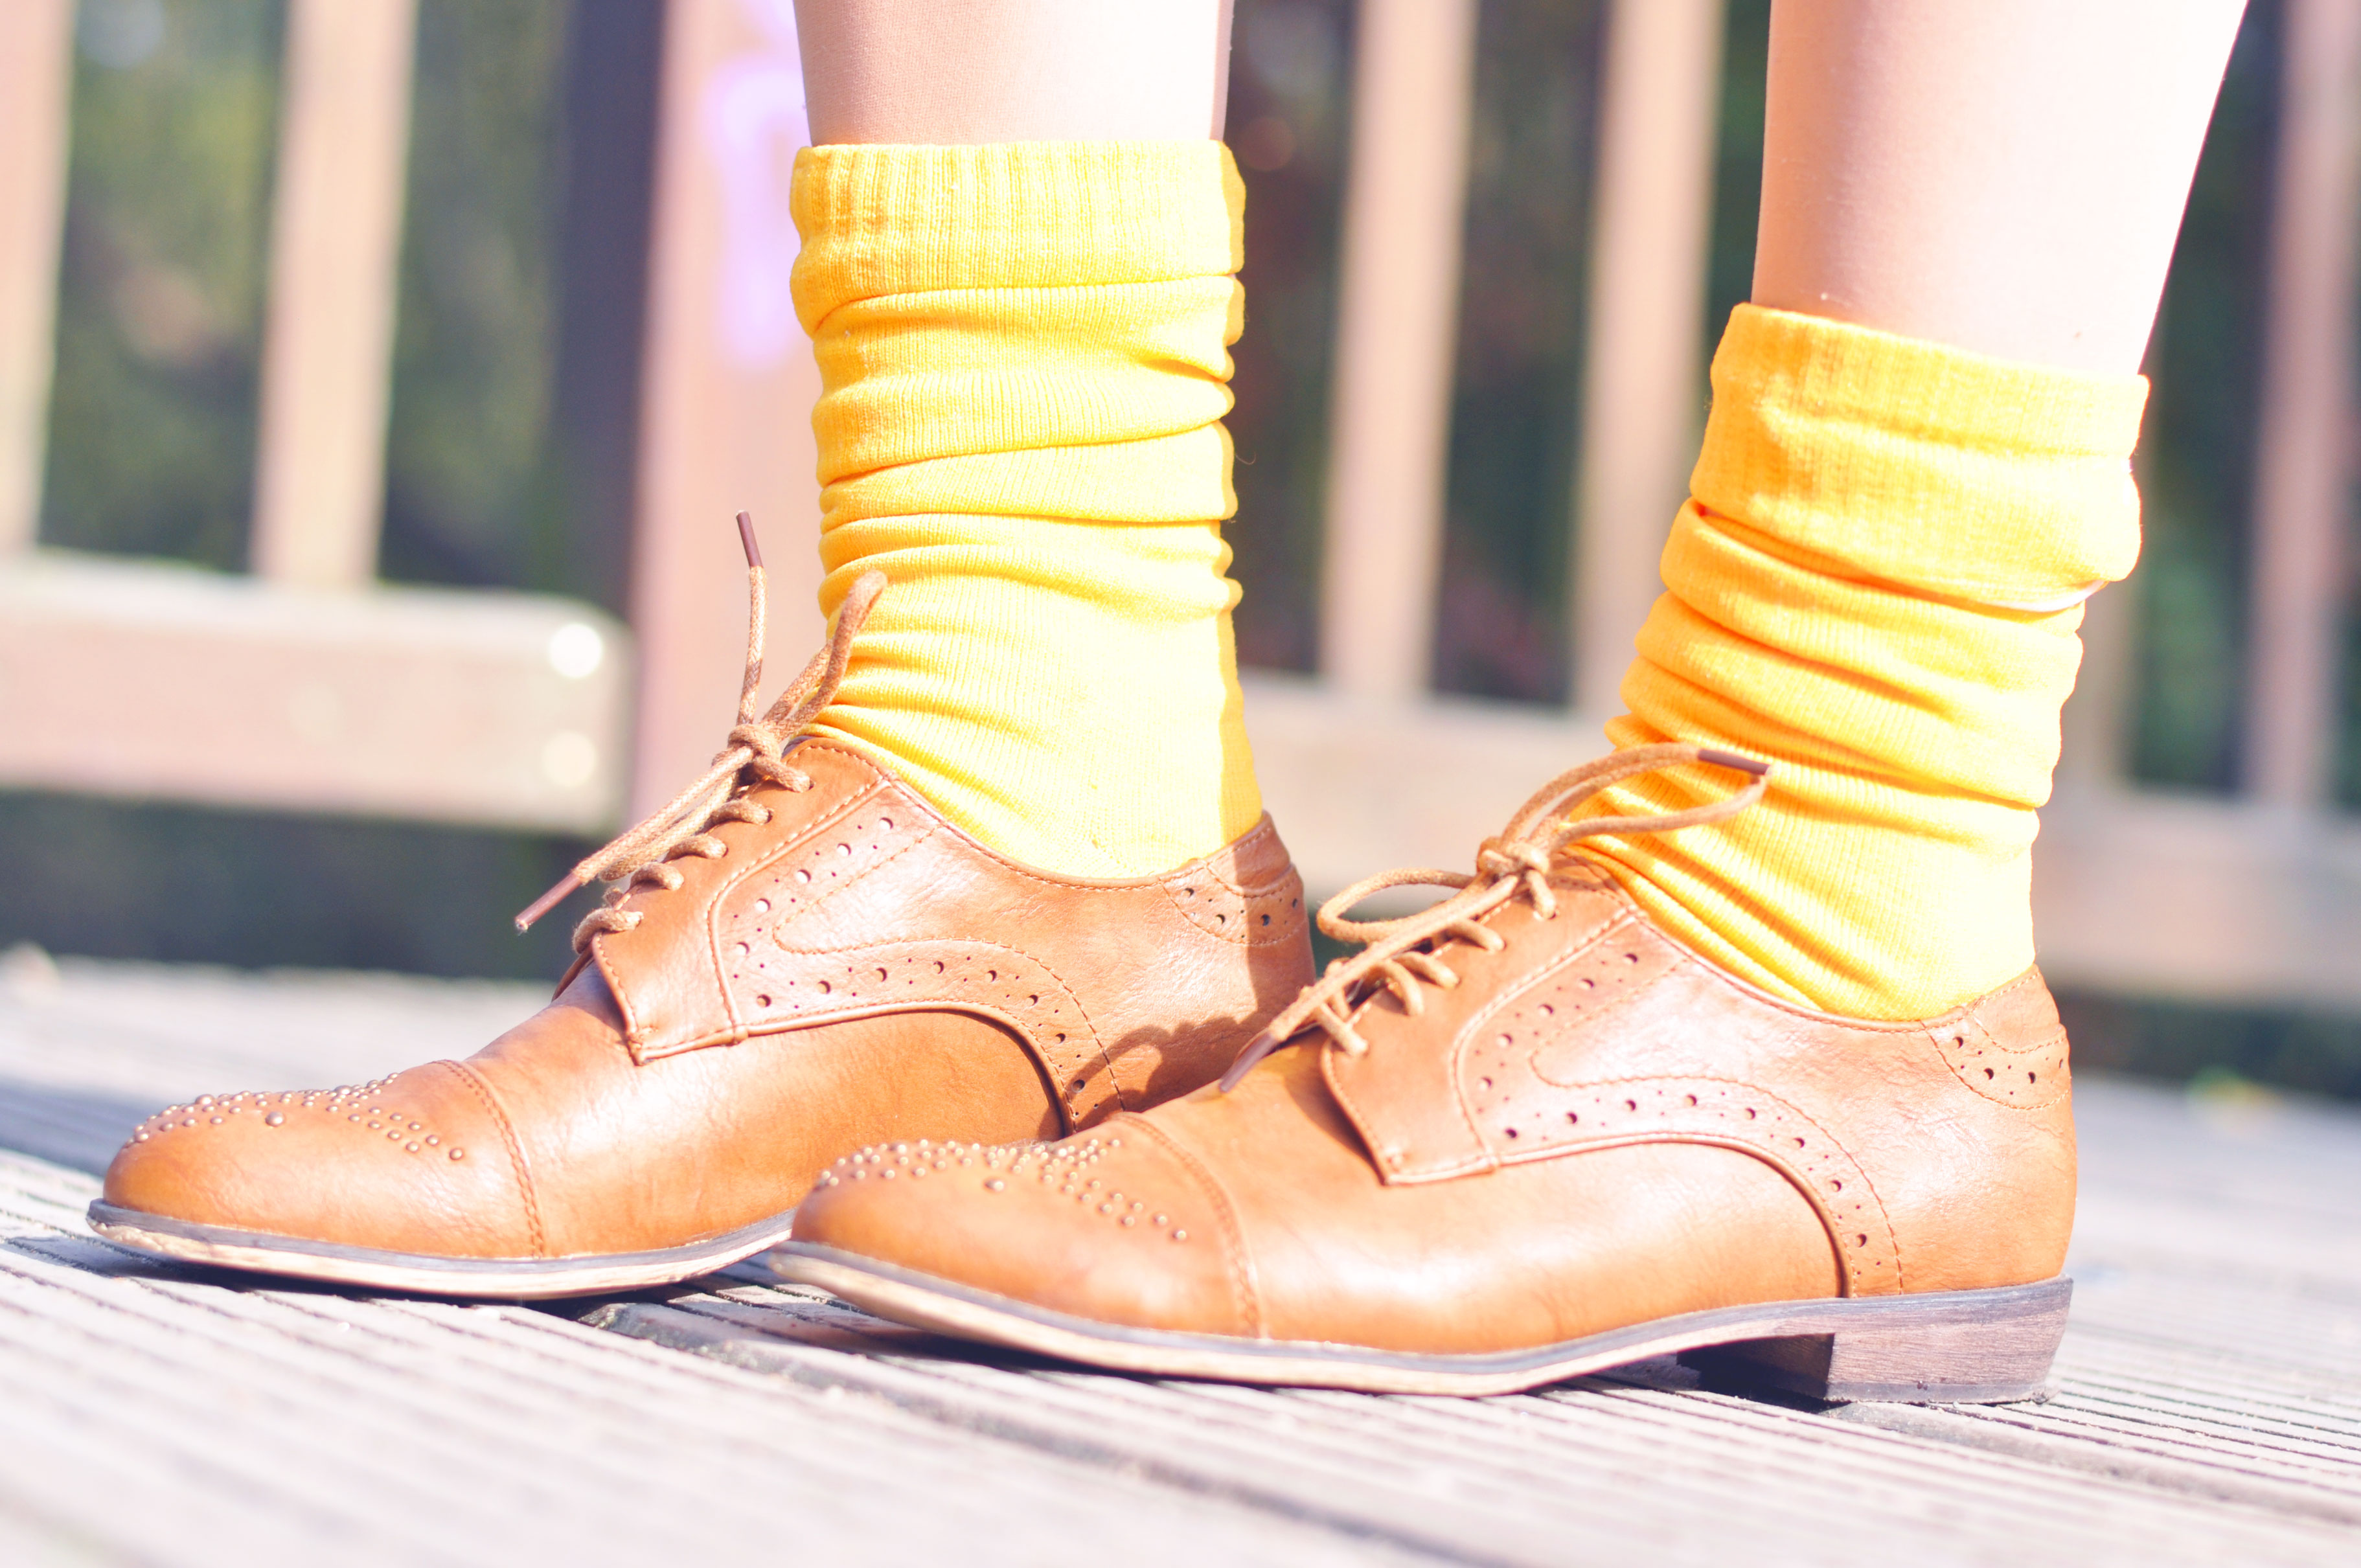 Schuhe von Jepo.de Budapester